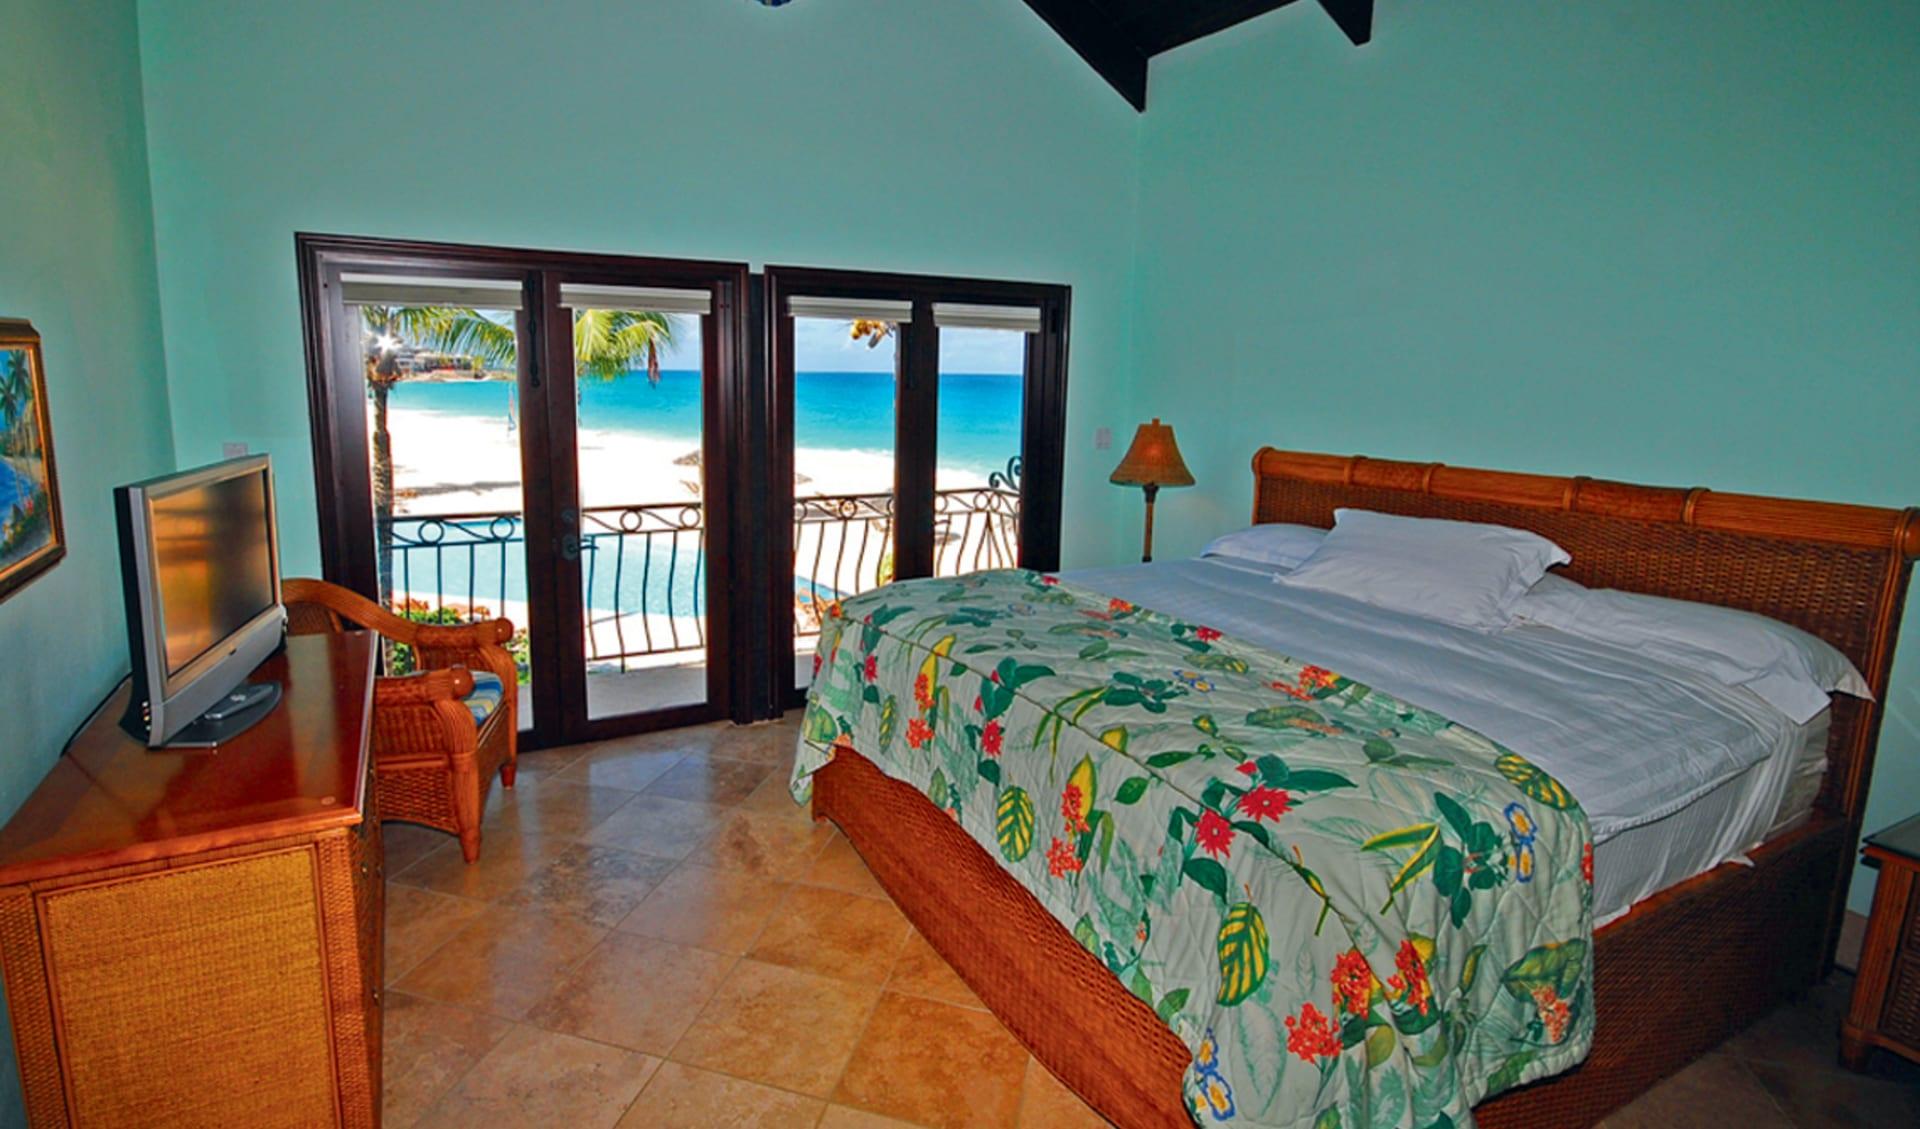 Frangipani Beach Resort in Meads Bay: zimmer frangipani beach resort doppelzimmer